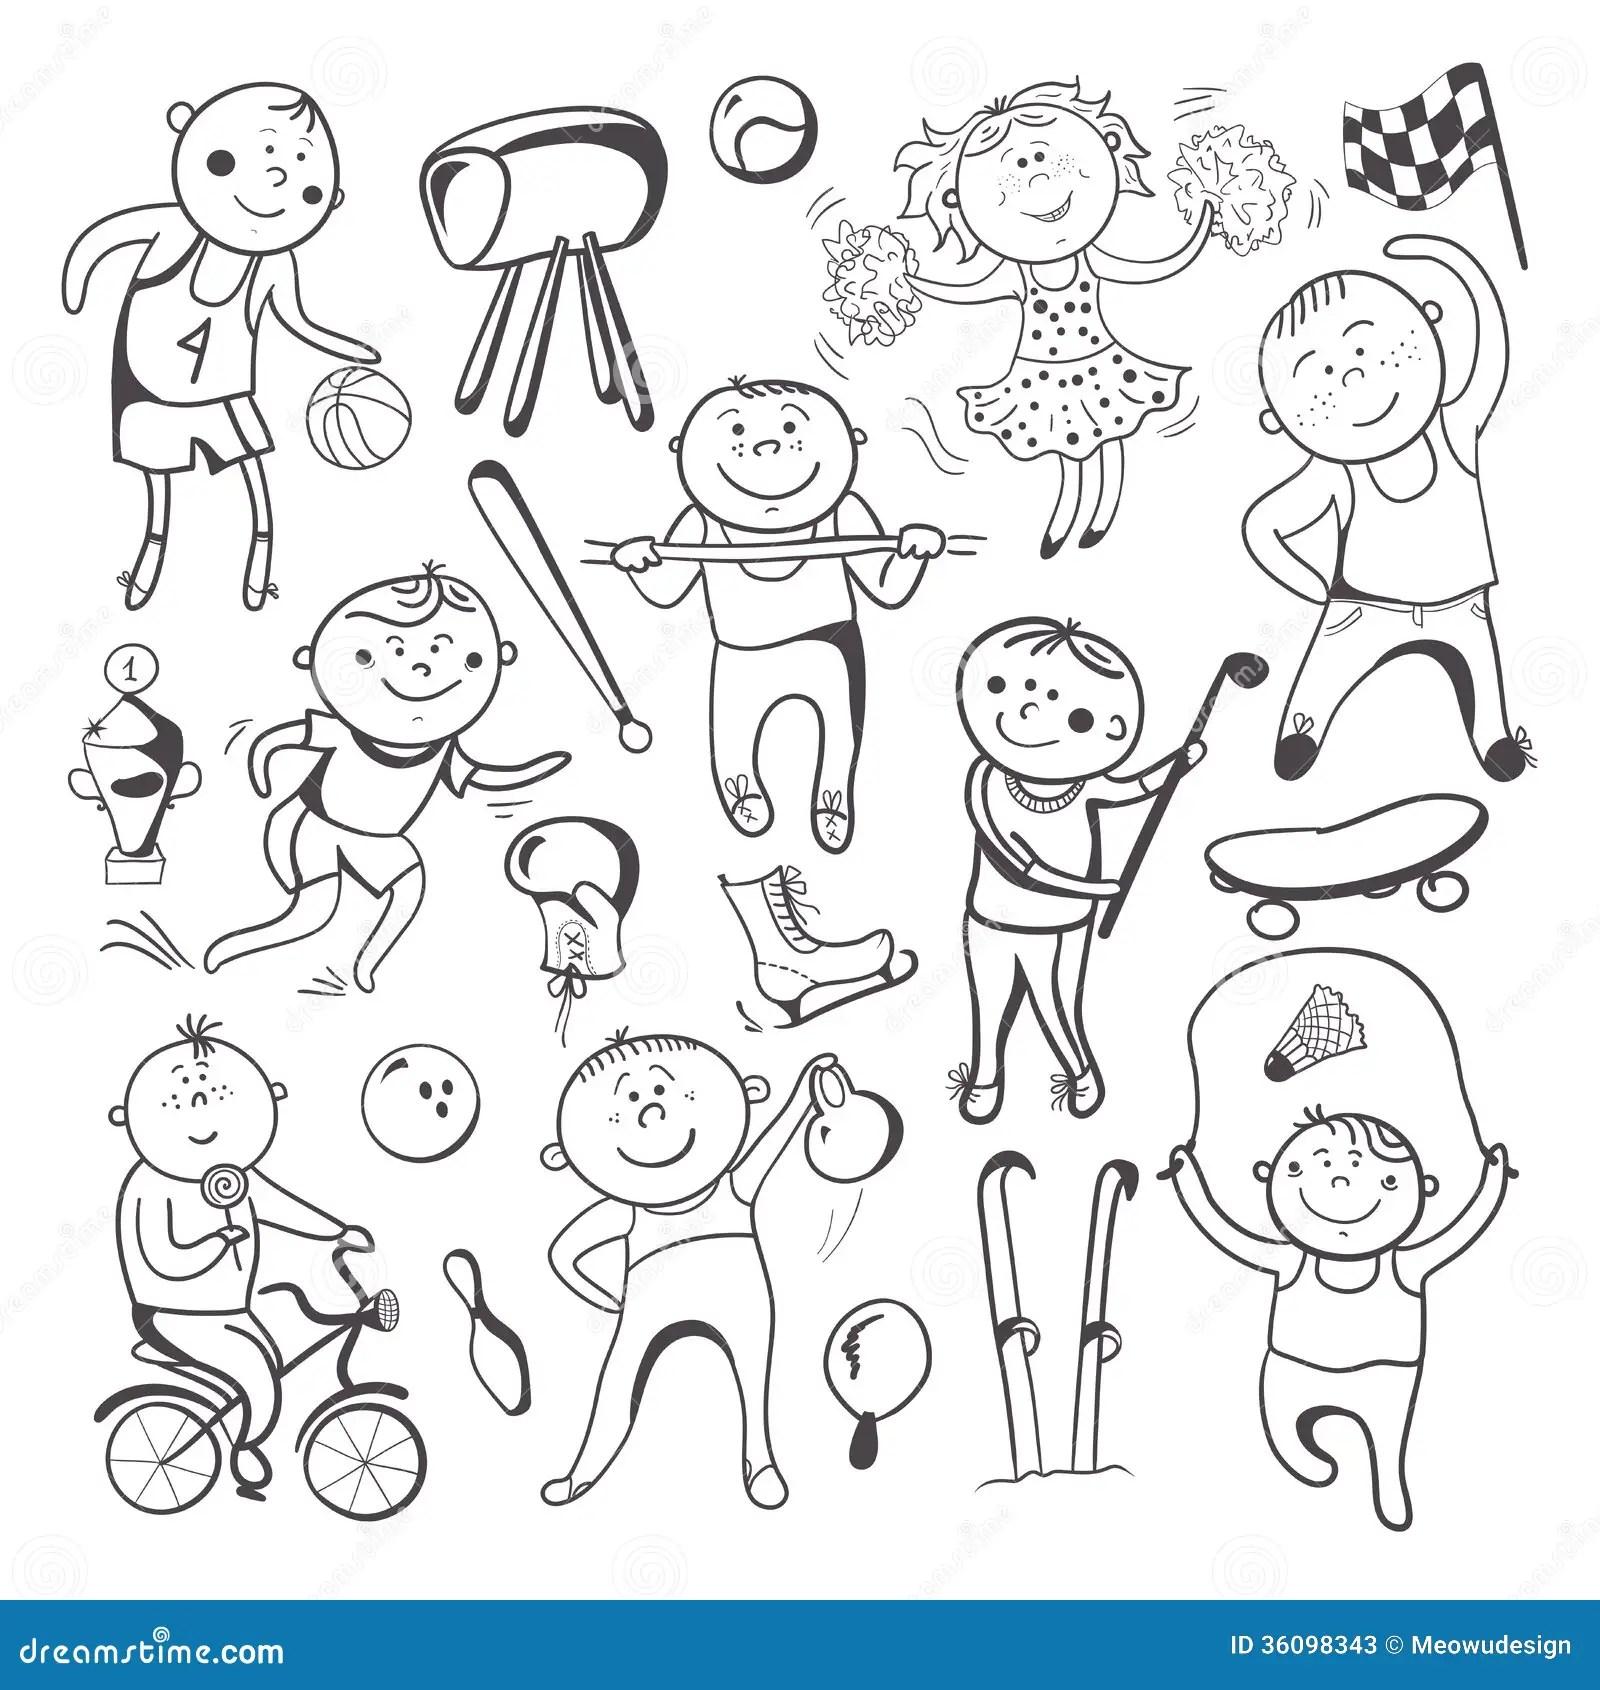 Black White Sketch Sport Players Stock Photos